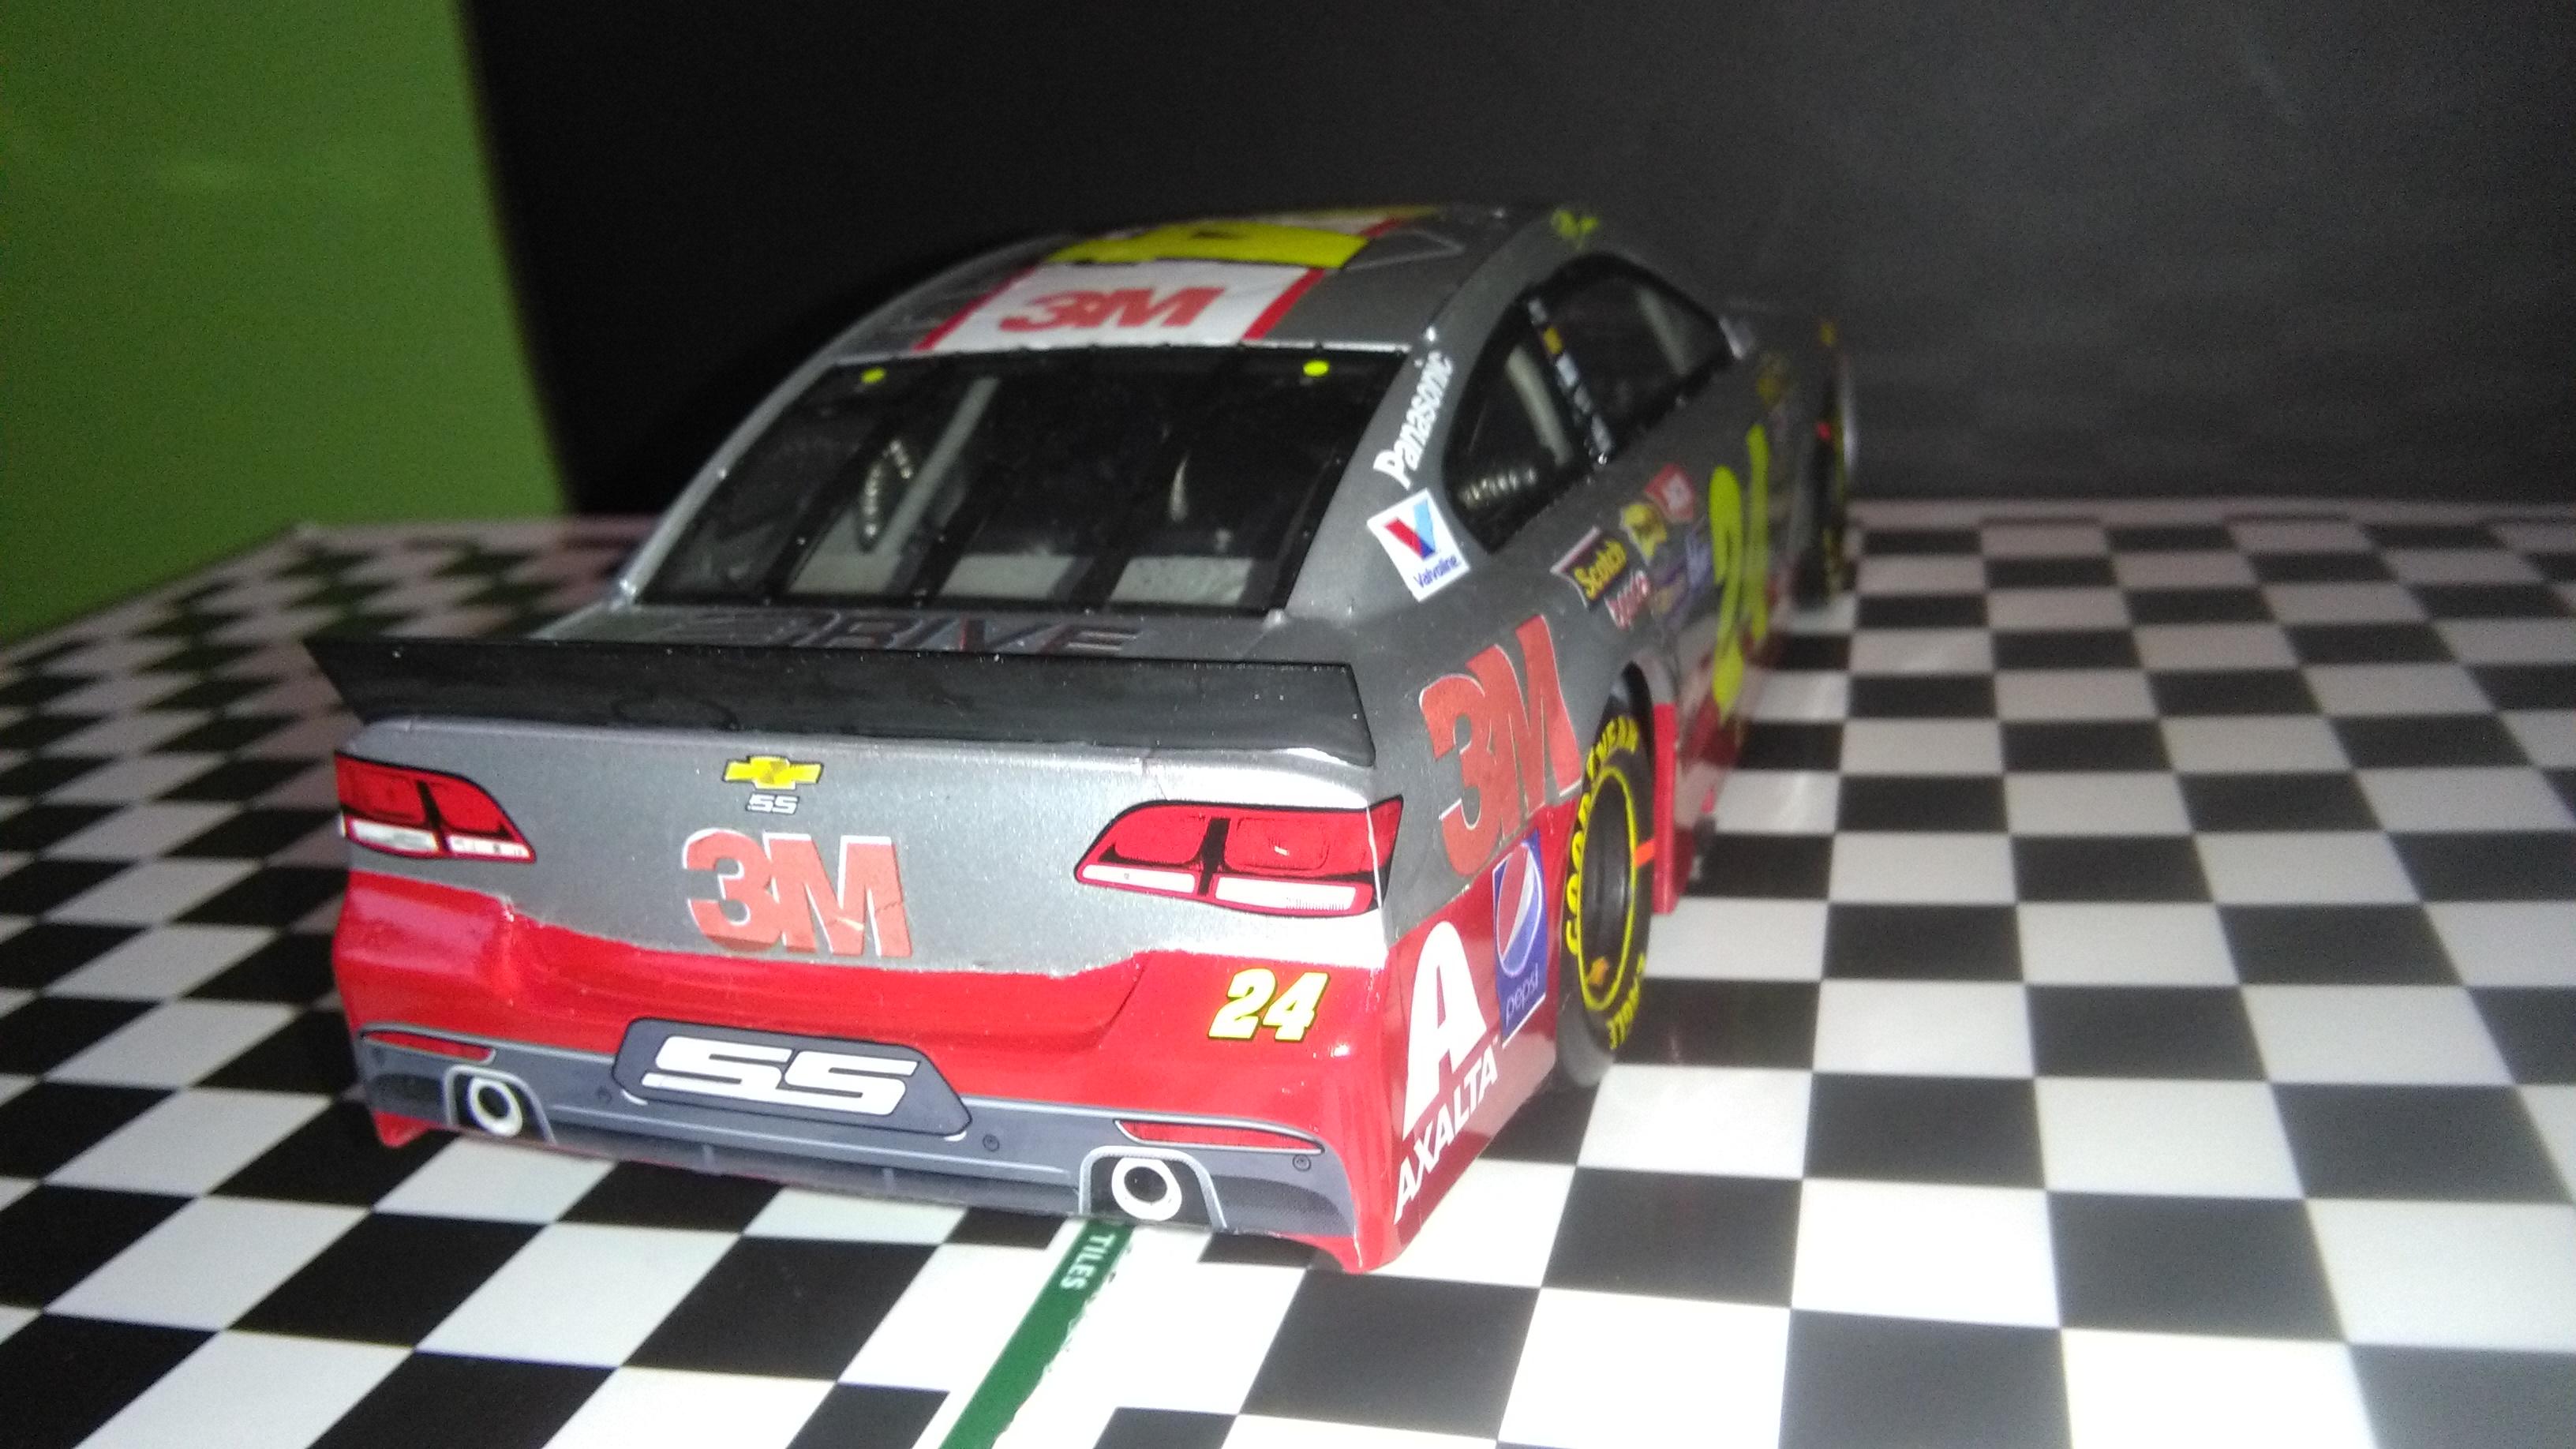 Chevrolet SS 2015 #24 Jeff Gordon 3M 849754IMG20170320183410